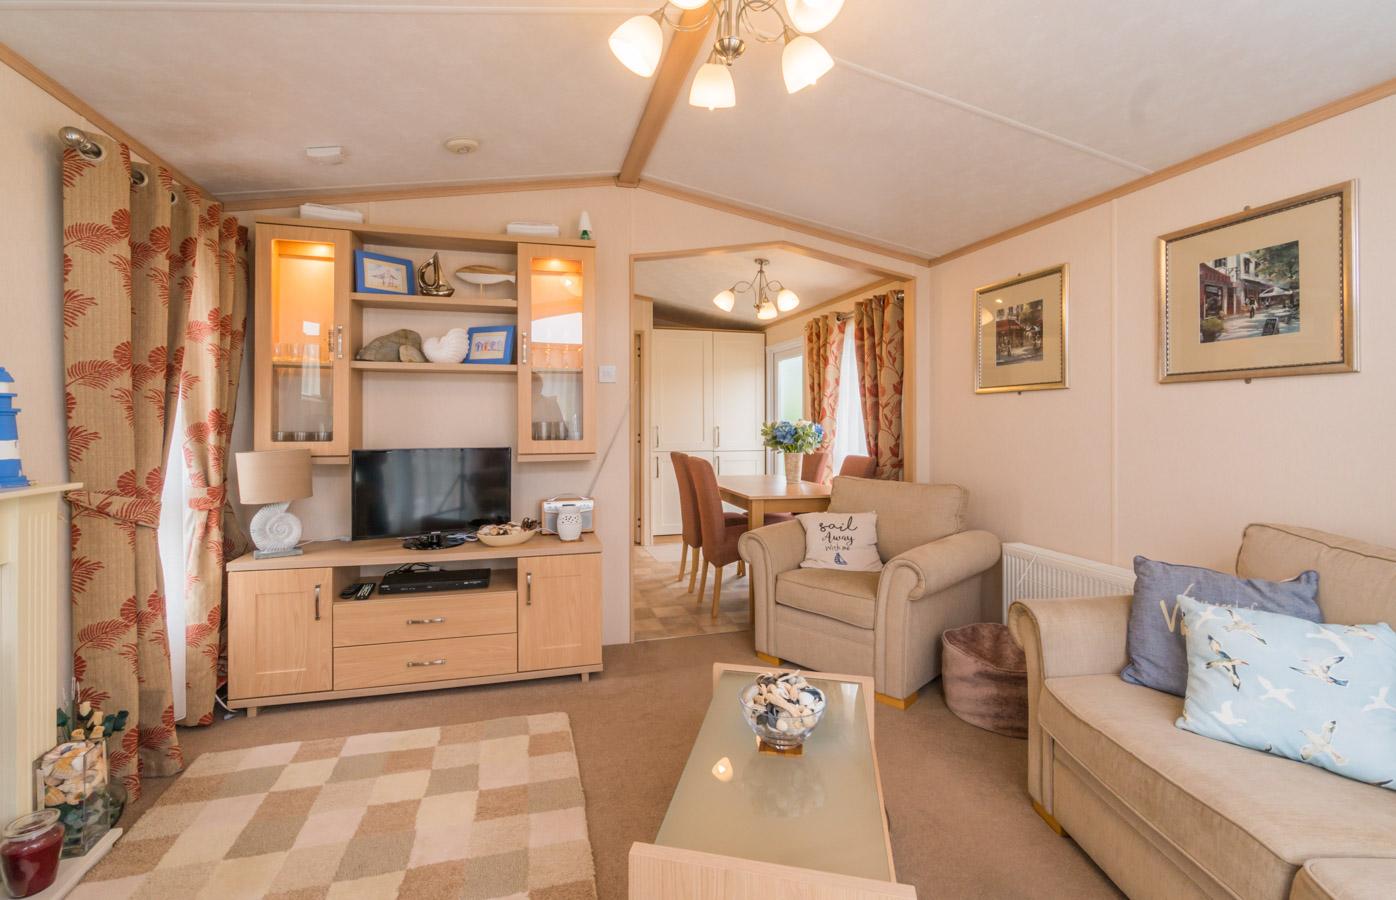 Monkton Wyld West Dorset East Devon Static Mobile Home Sale Plot 6 Charmouth Lyme Regis